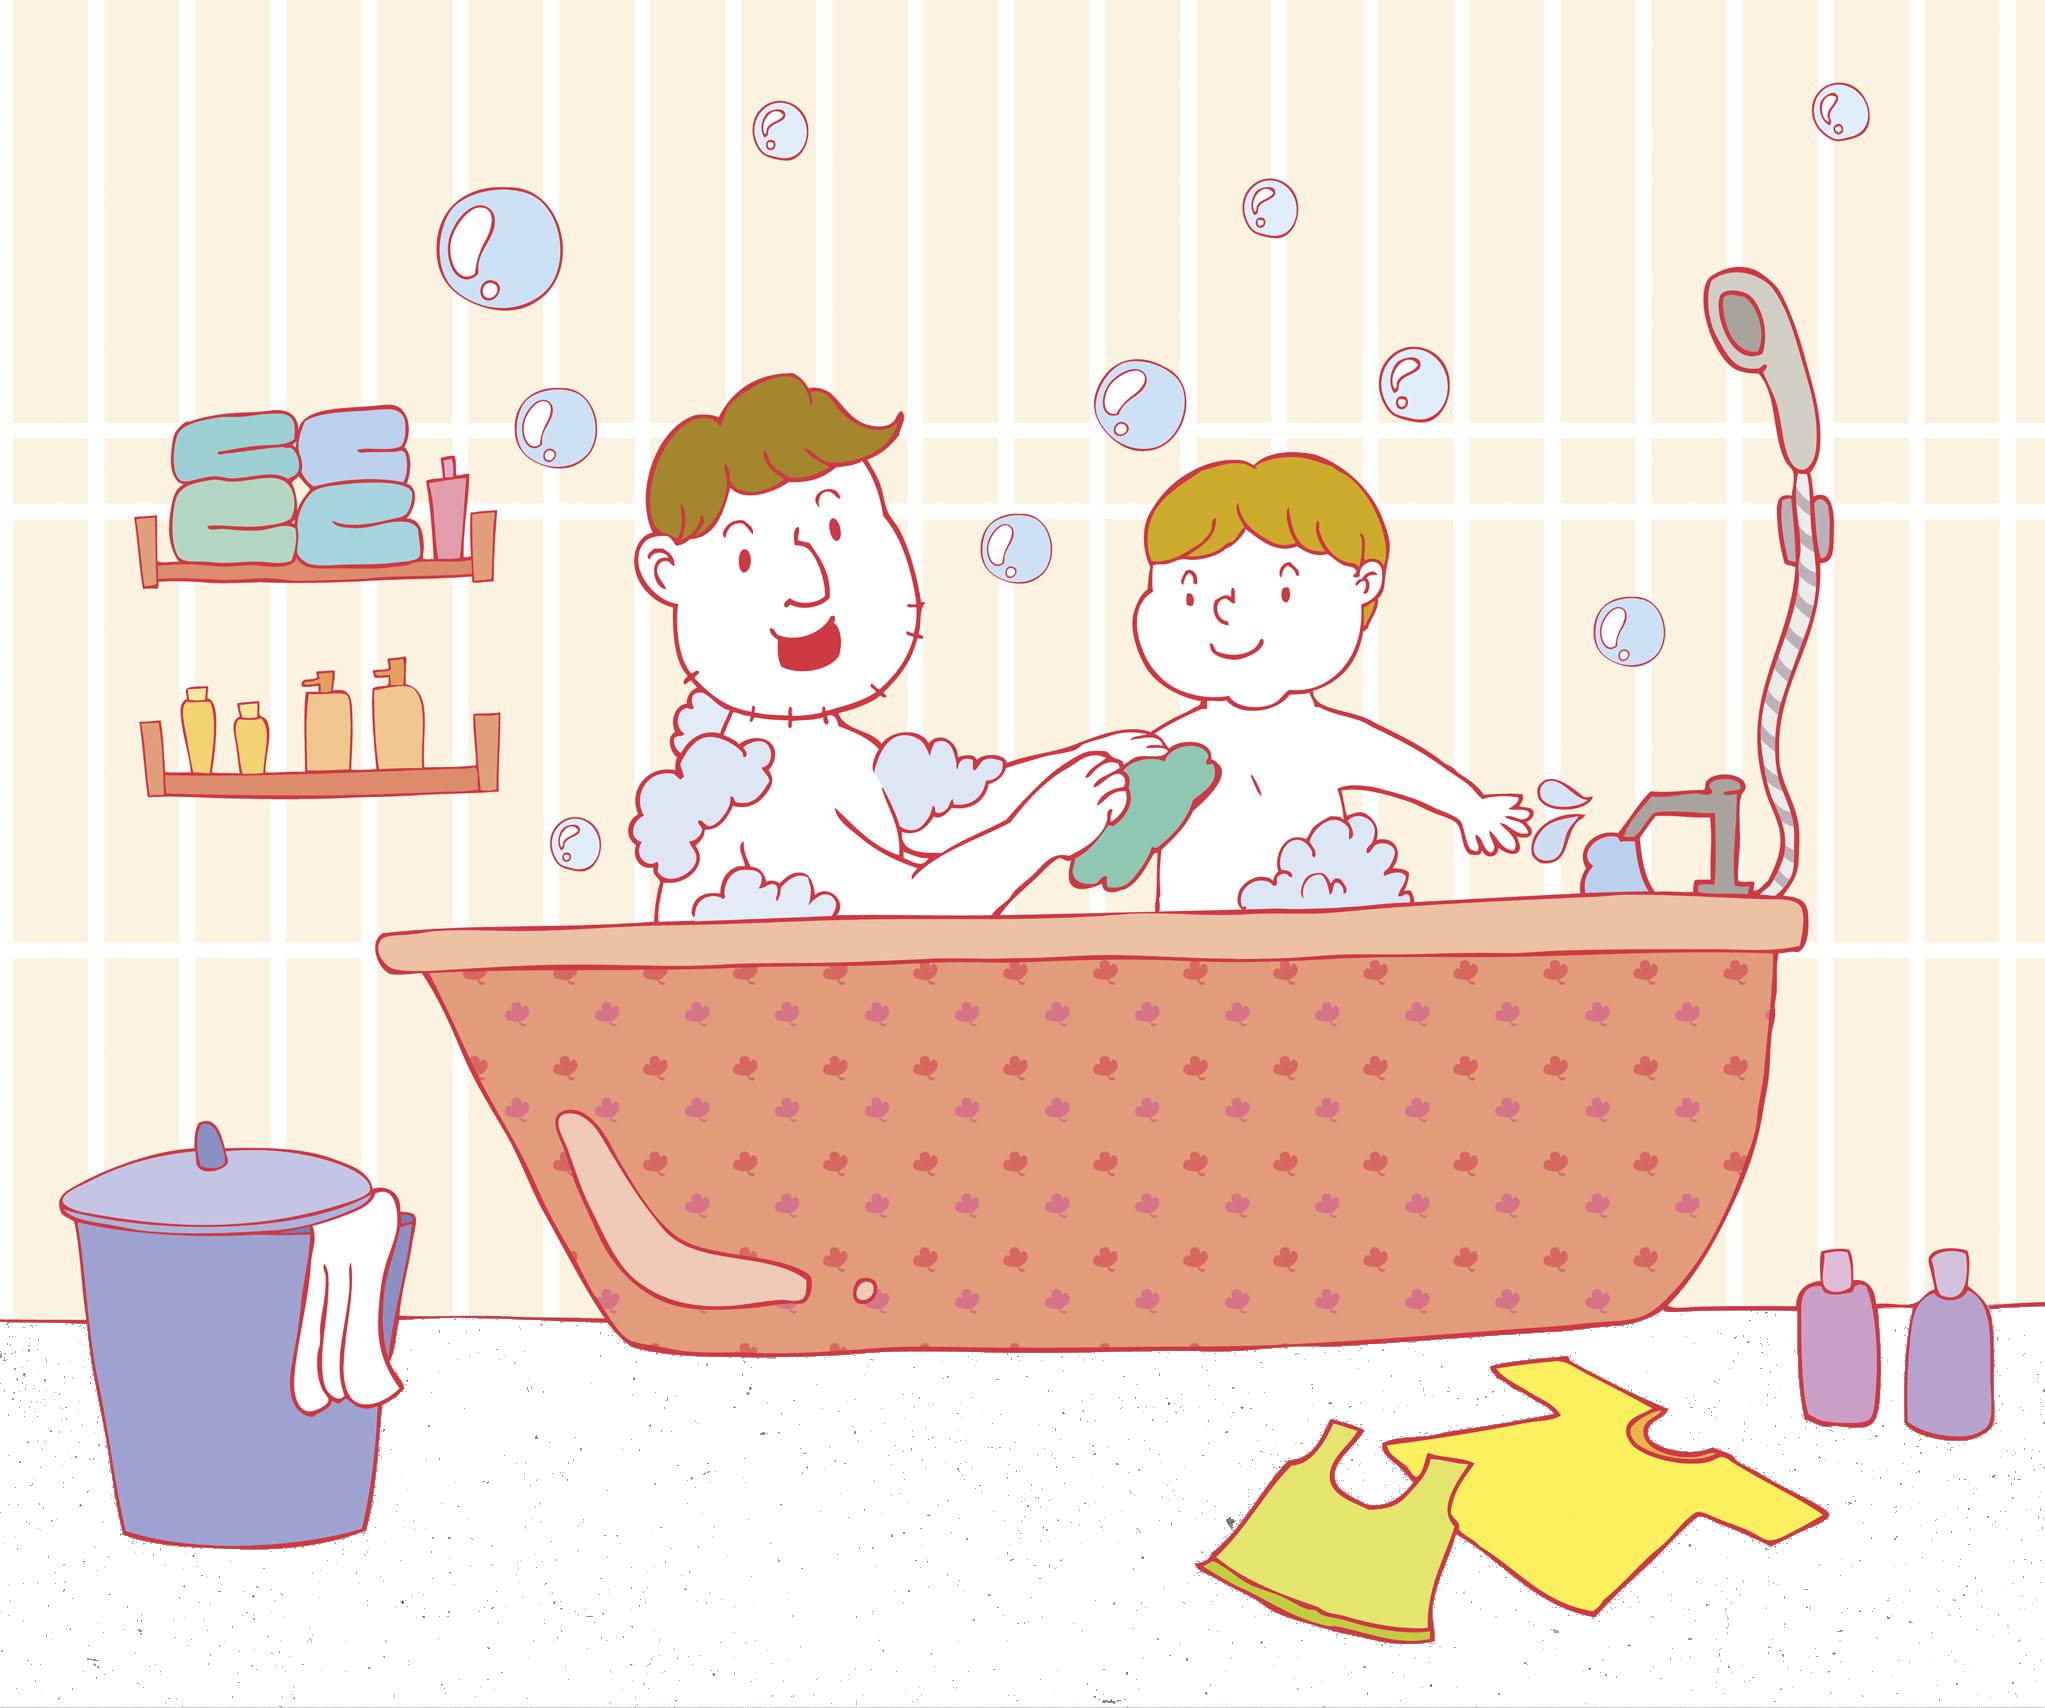 Showering clipart bathub. Bathing bathtub shower father